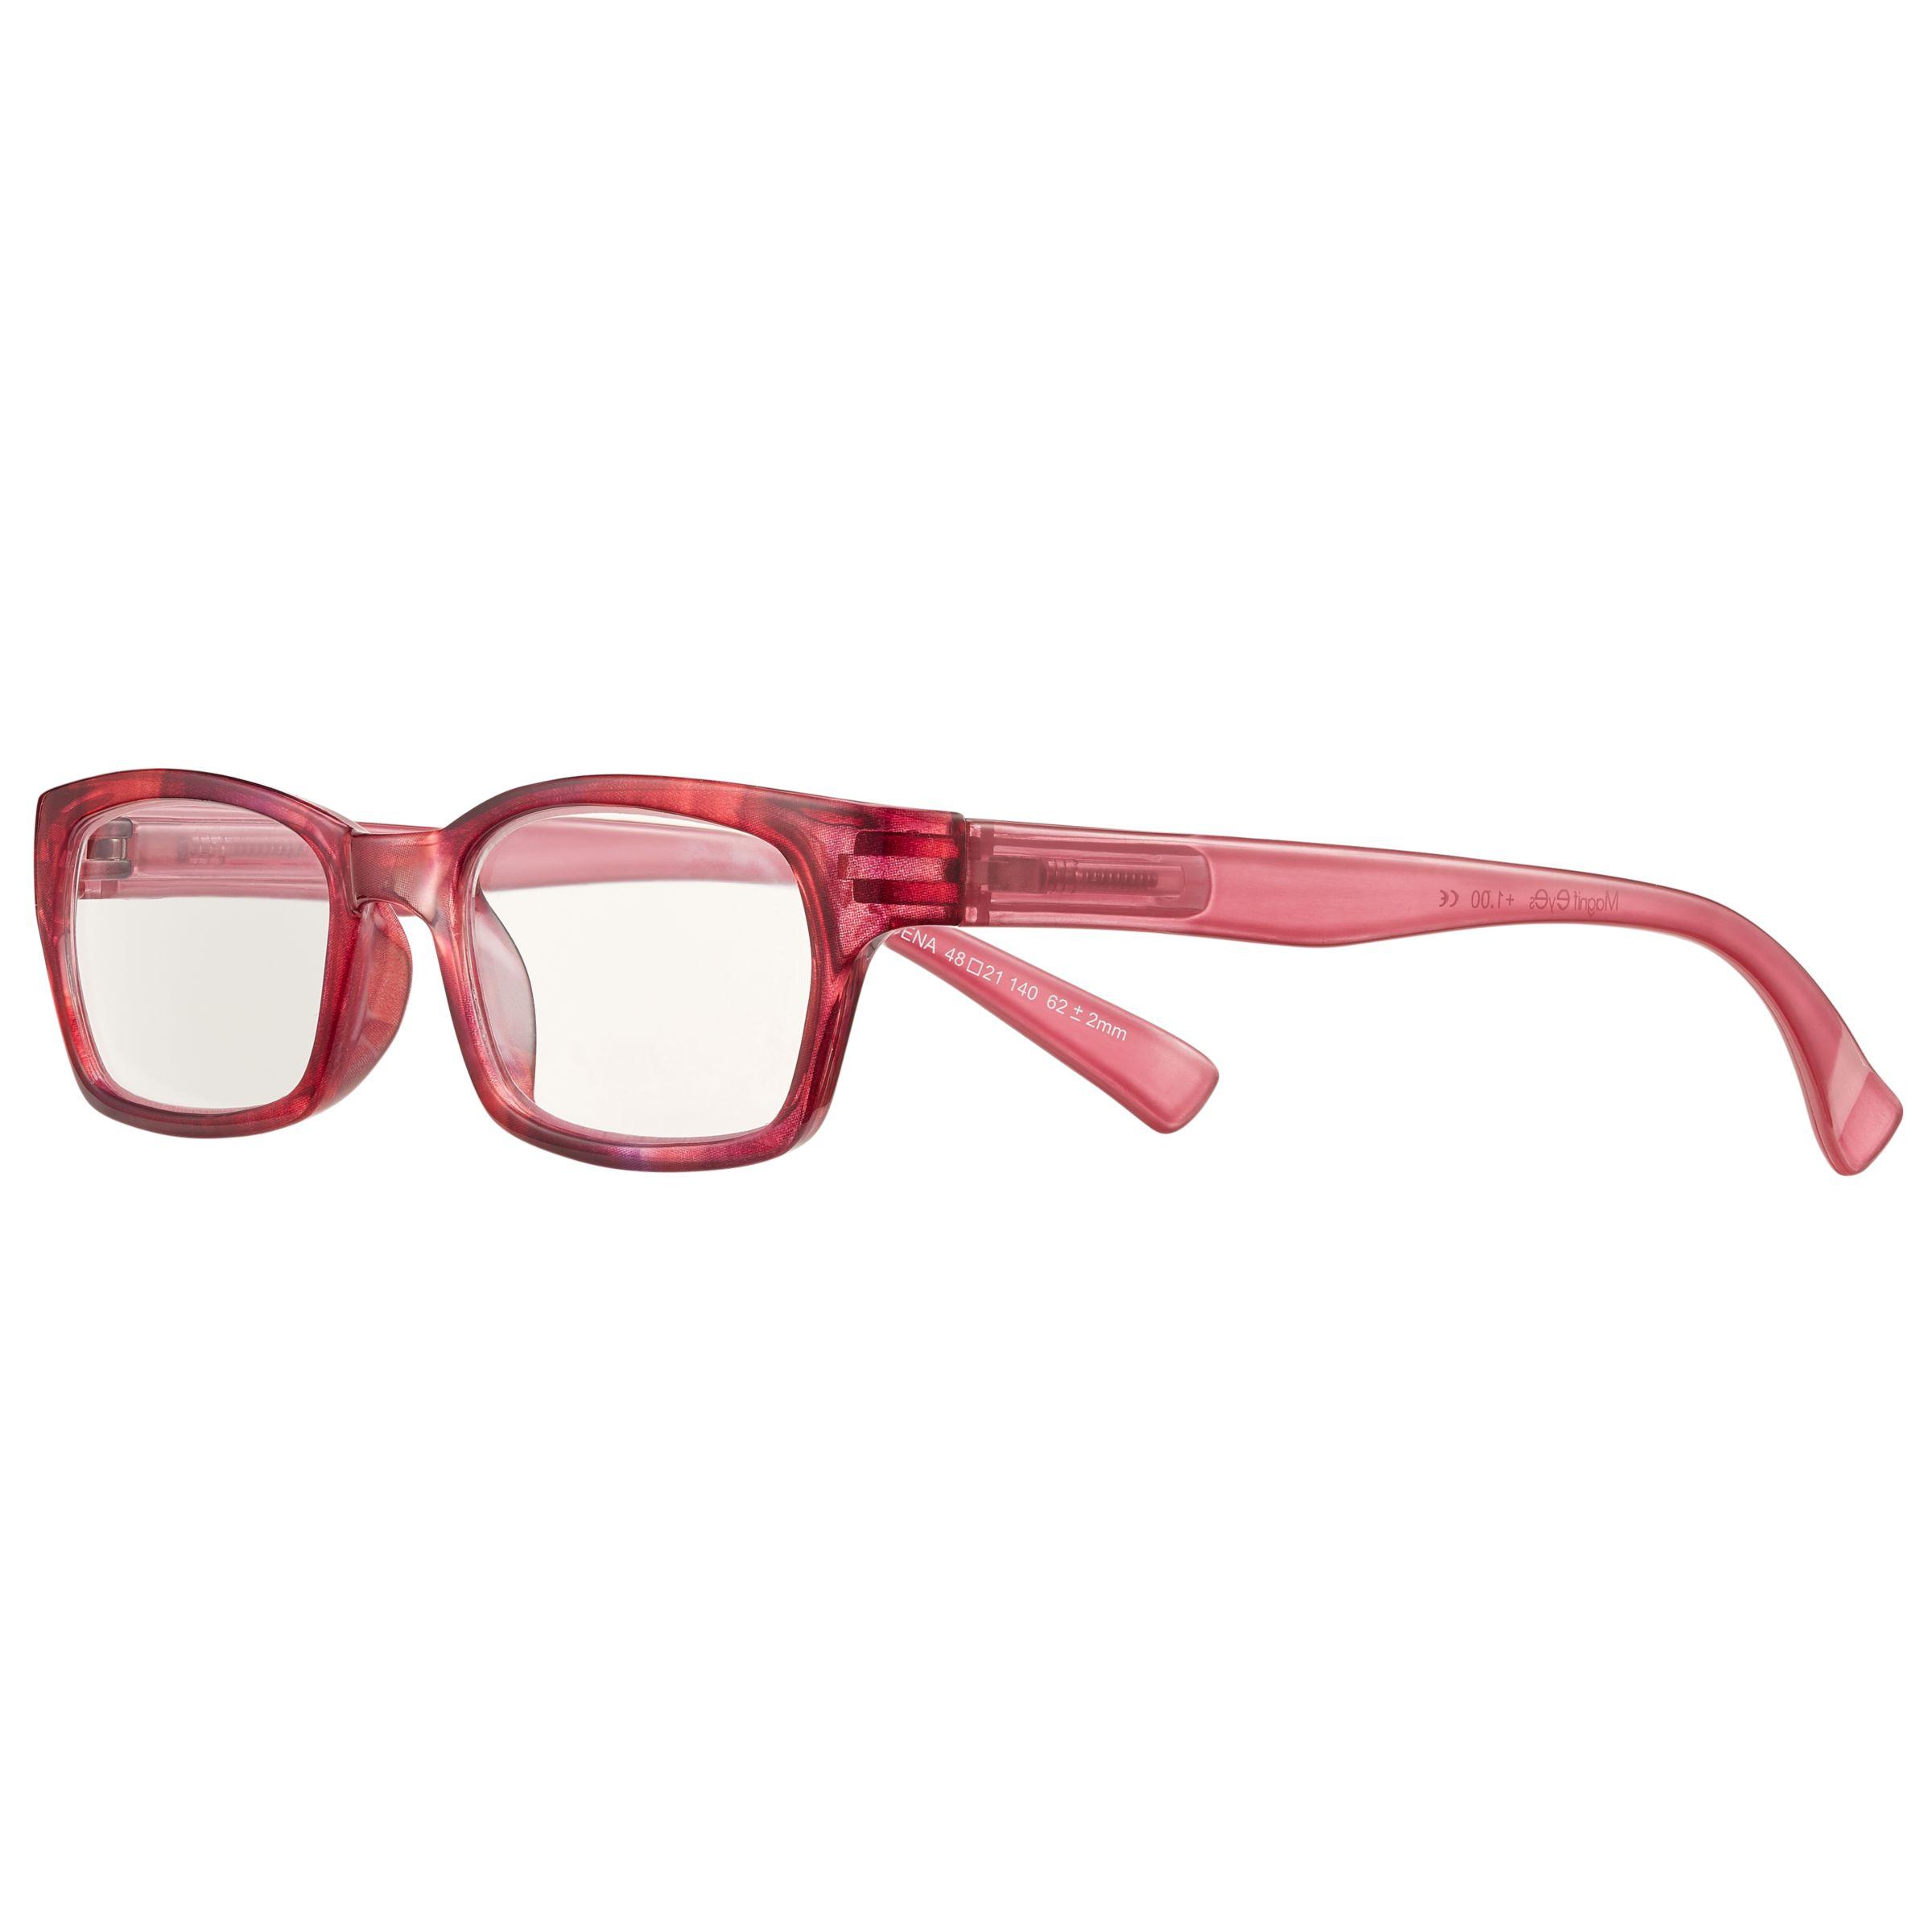 Magnif Eyes Magnif Eyes Ready Readers Pasadena Glasses, Raspberry